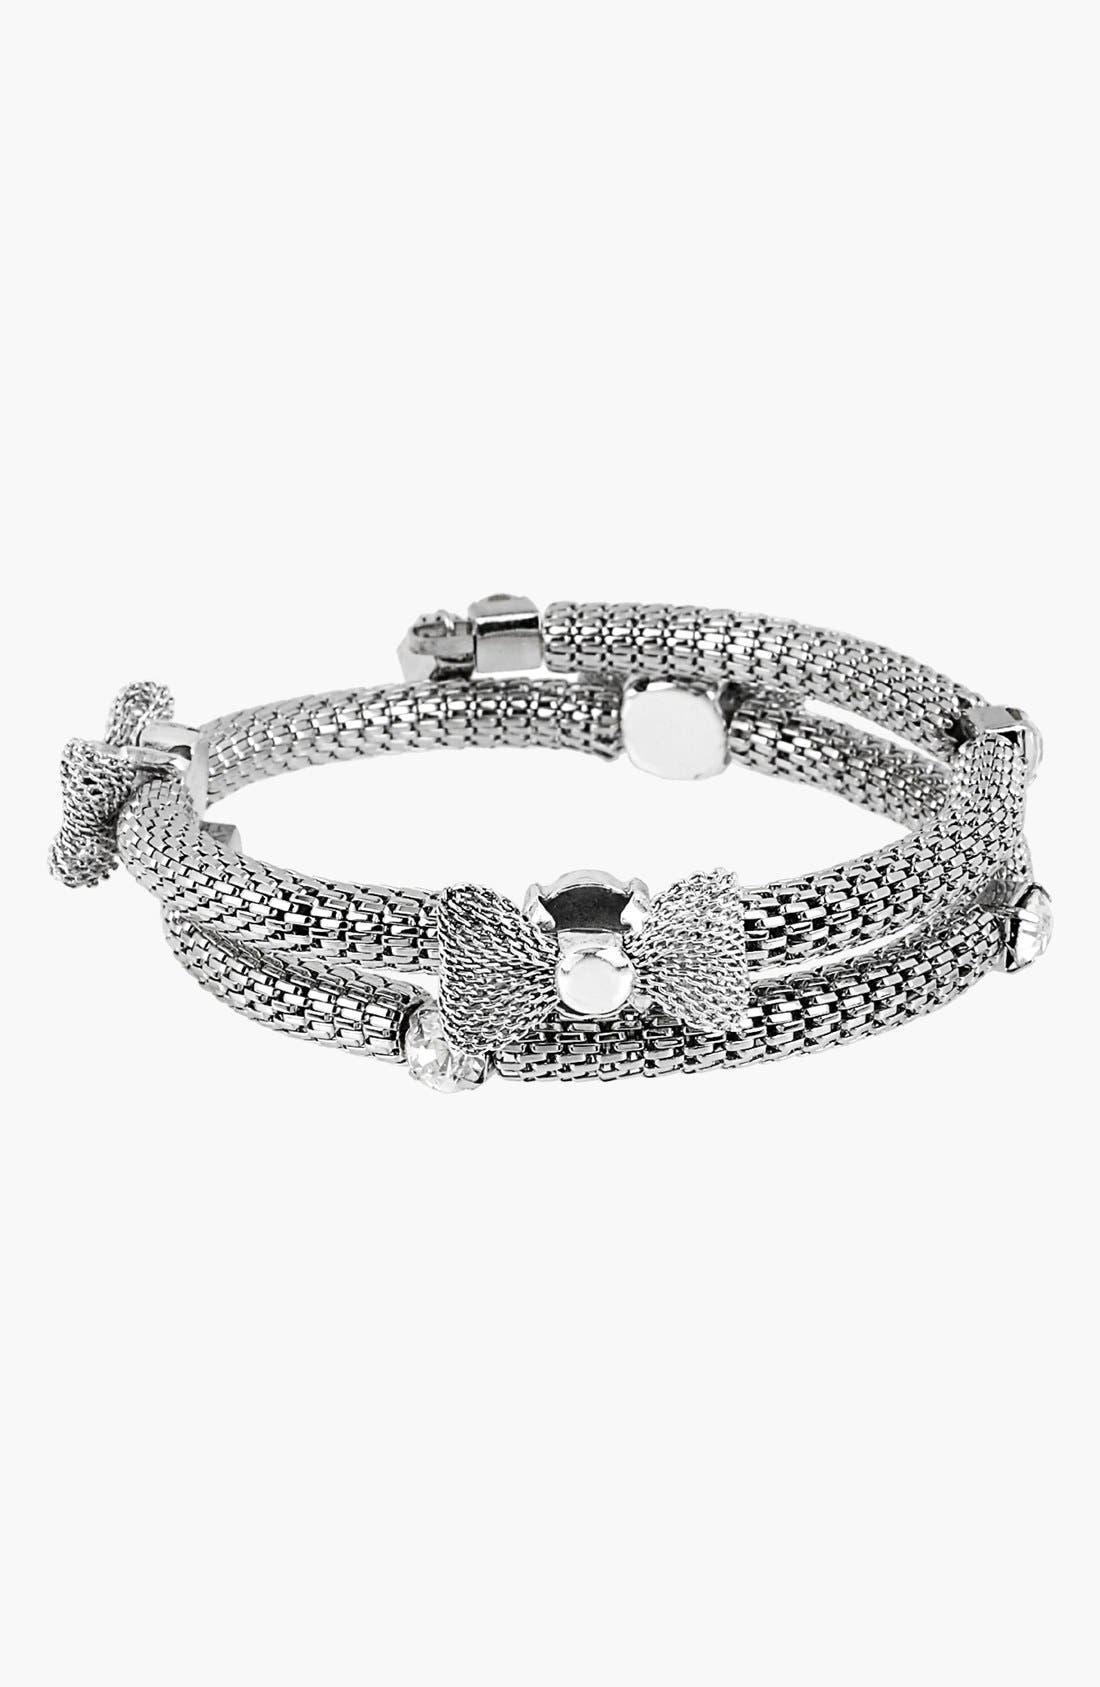 Alternate Image 1 Selected - Betsey Johnson 'Wear It Where?' Bow Coil Bracelet